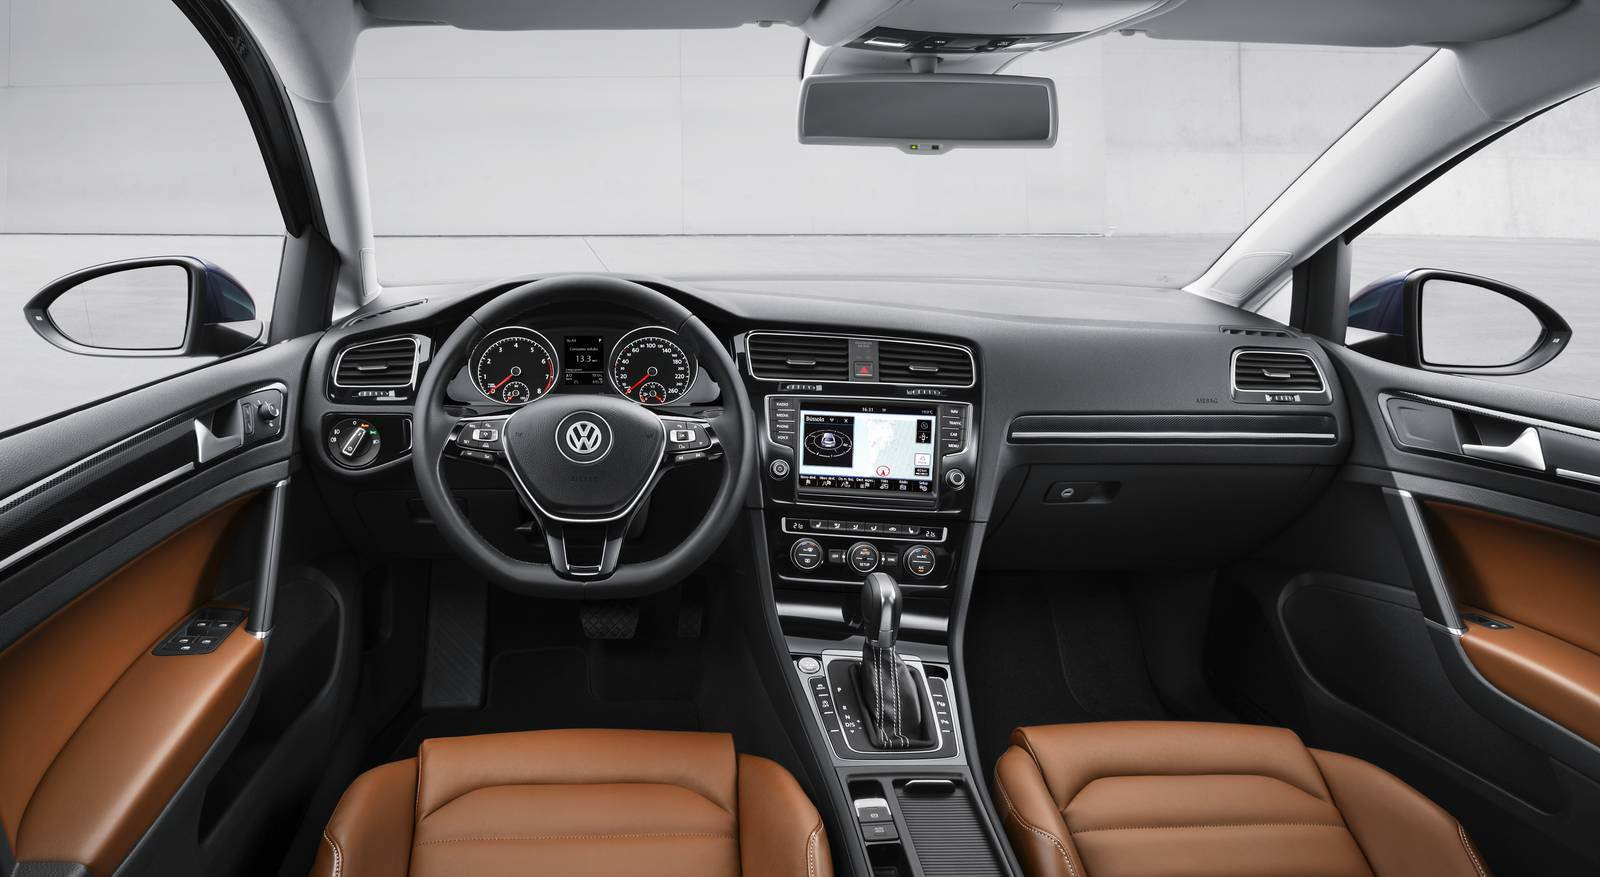 VW Golf 2013 - interior